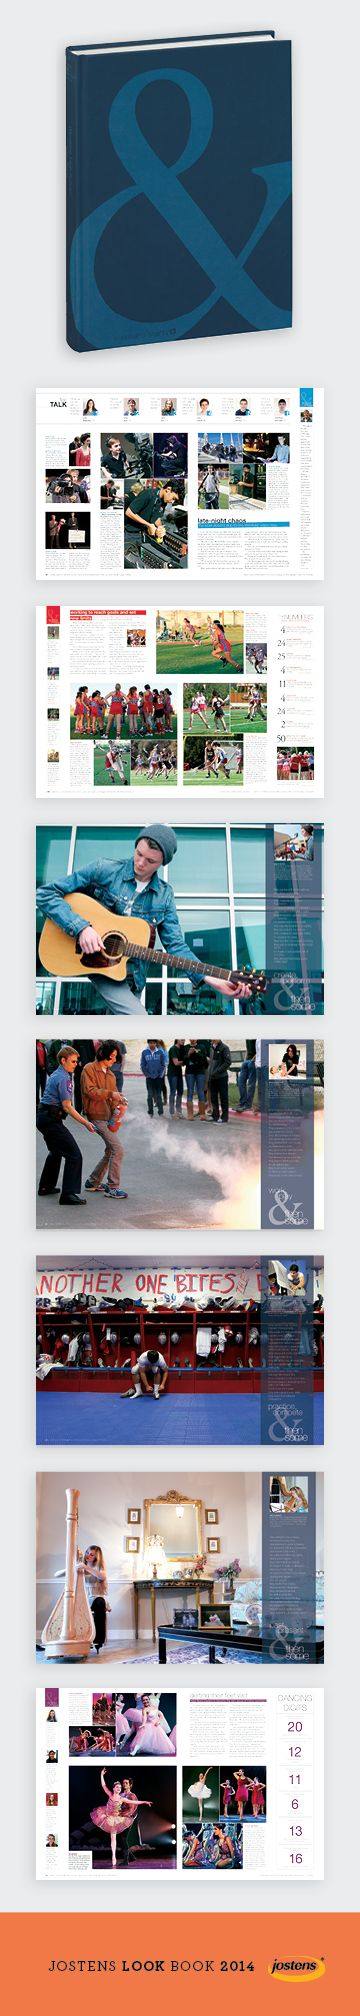 [El Paisano, Westlake High School, Austin, TX] #YBKlove